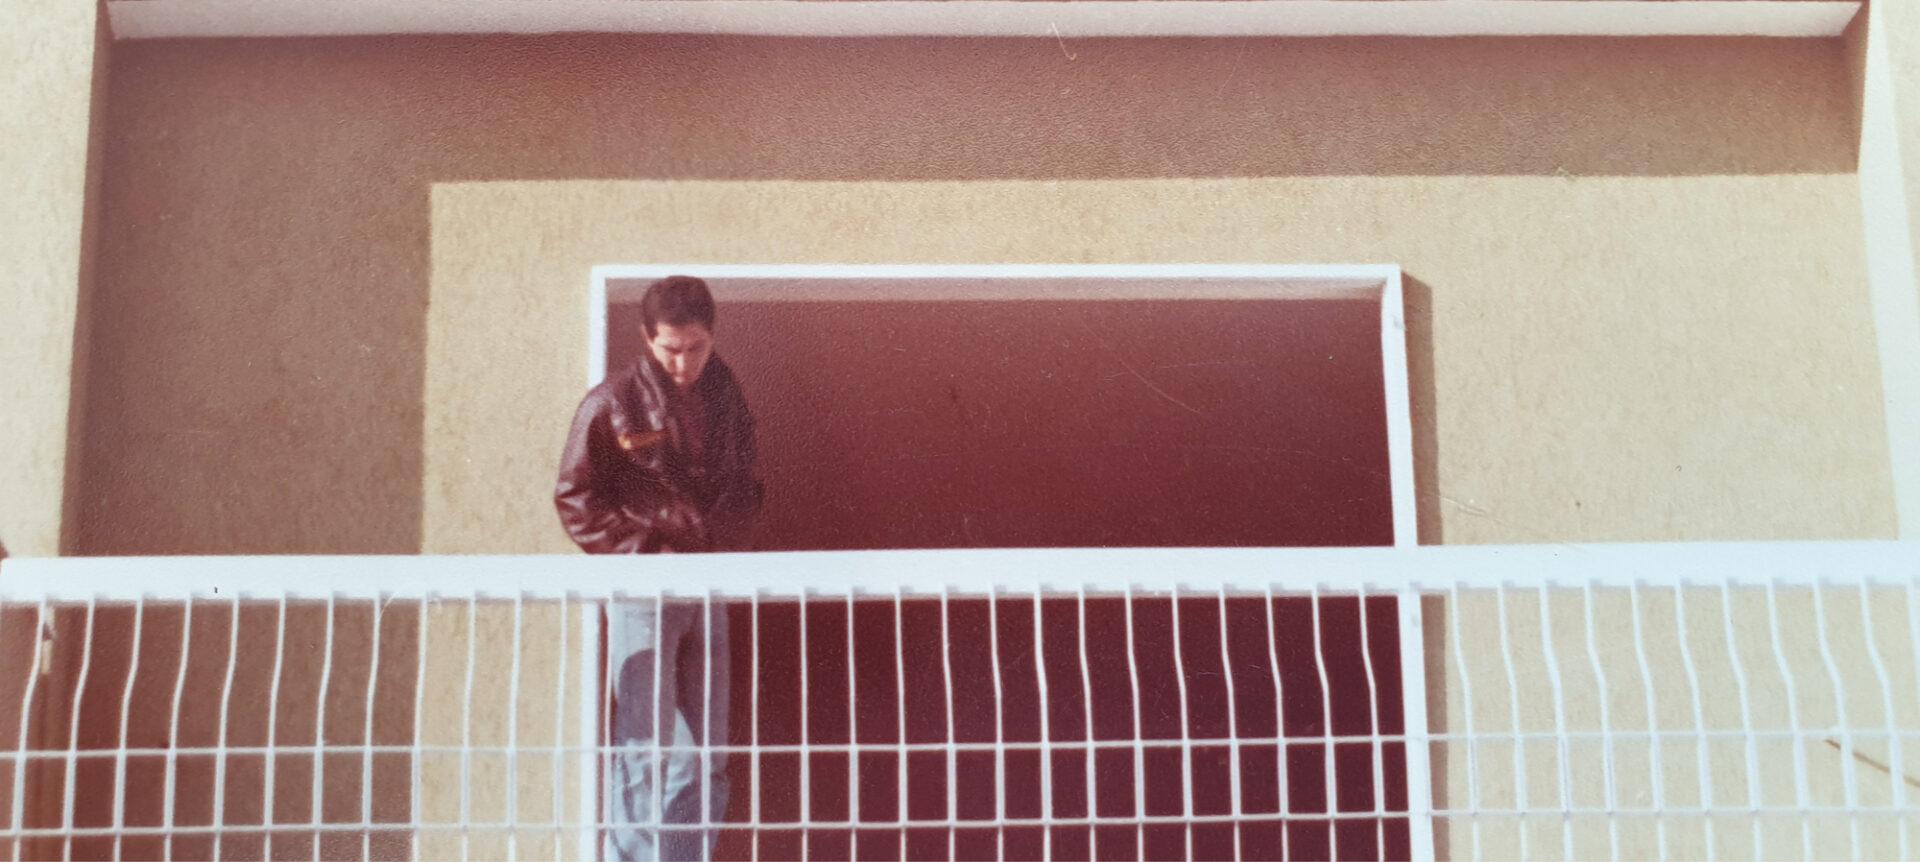 Uomo sul terrazzo - Cittamoderna